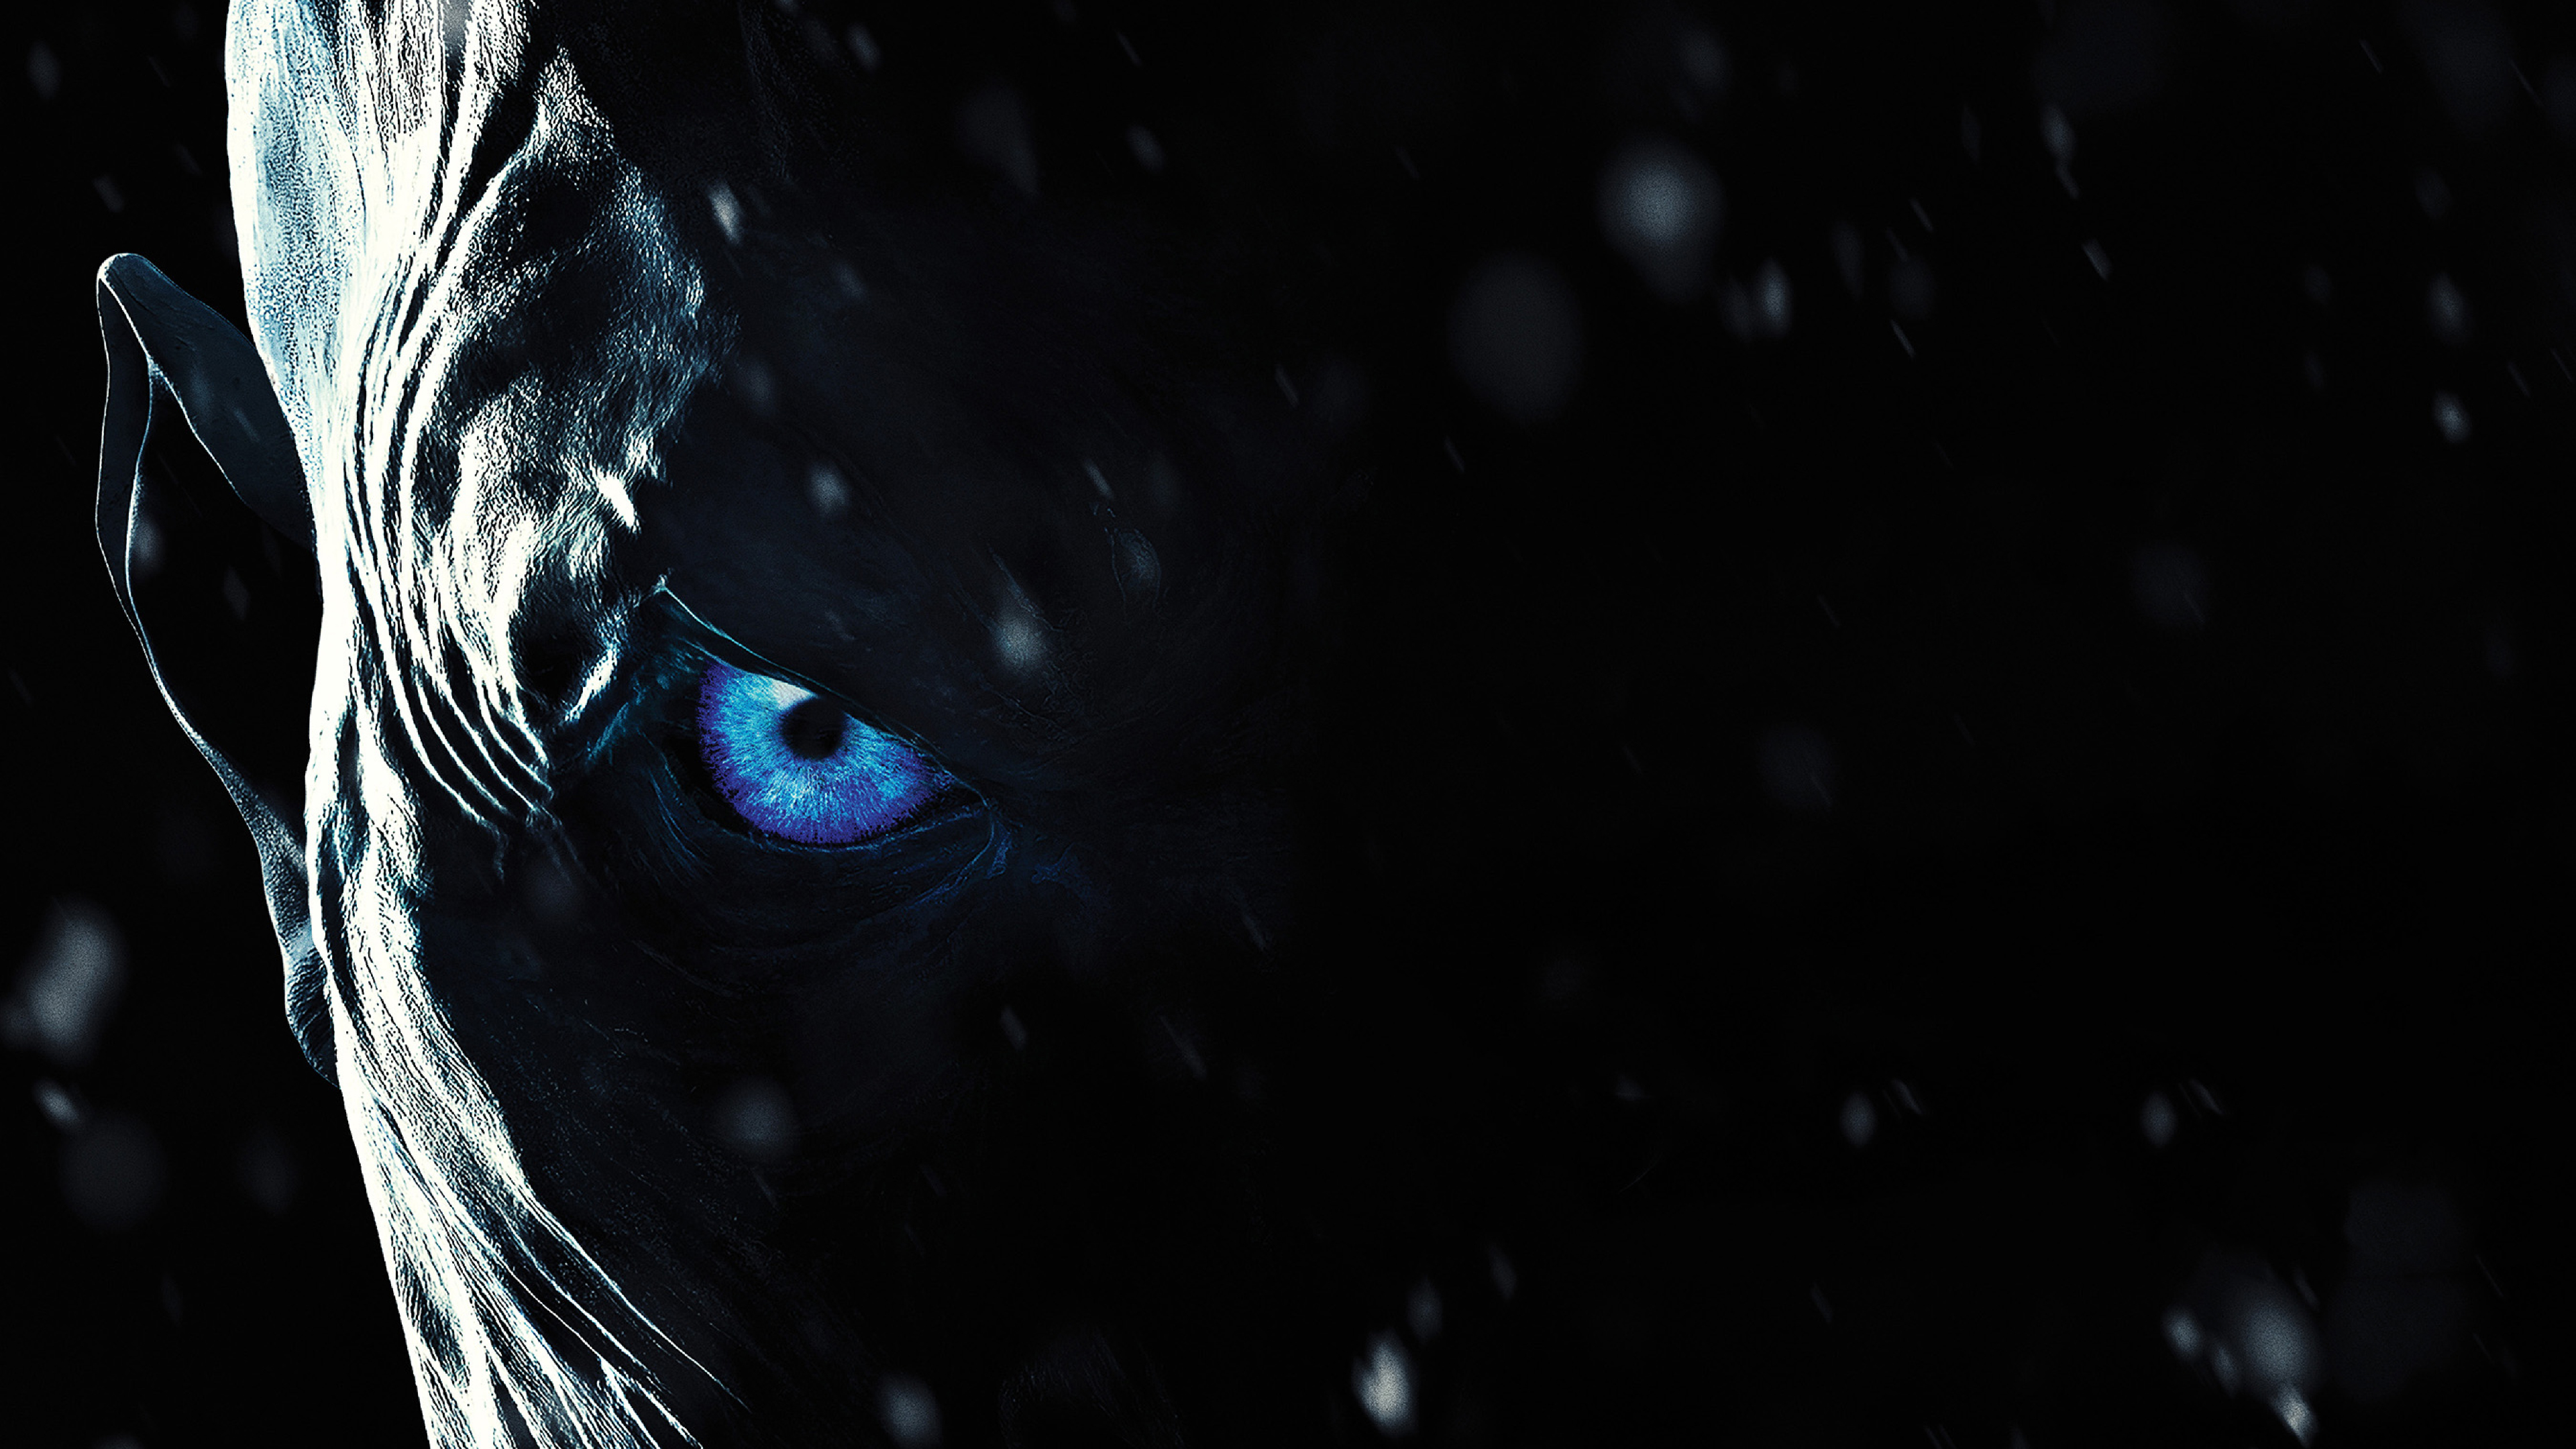 Download Die Original Wallpaper Des Samsung Galaxy S7: Game Of Thrones Season 7 White Walkers, Full HD 2K Wallpaper